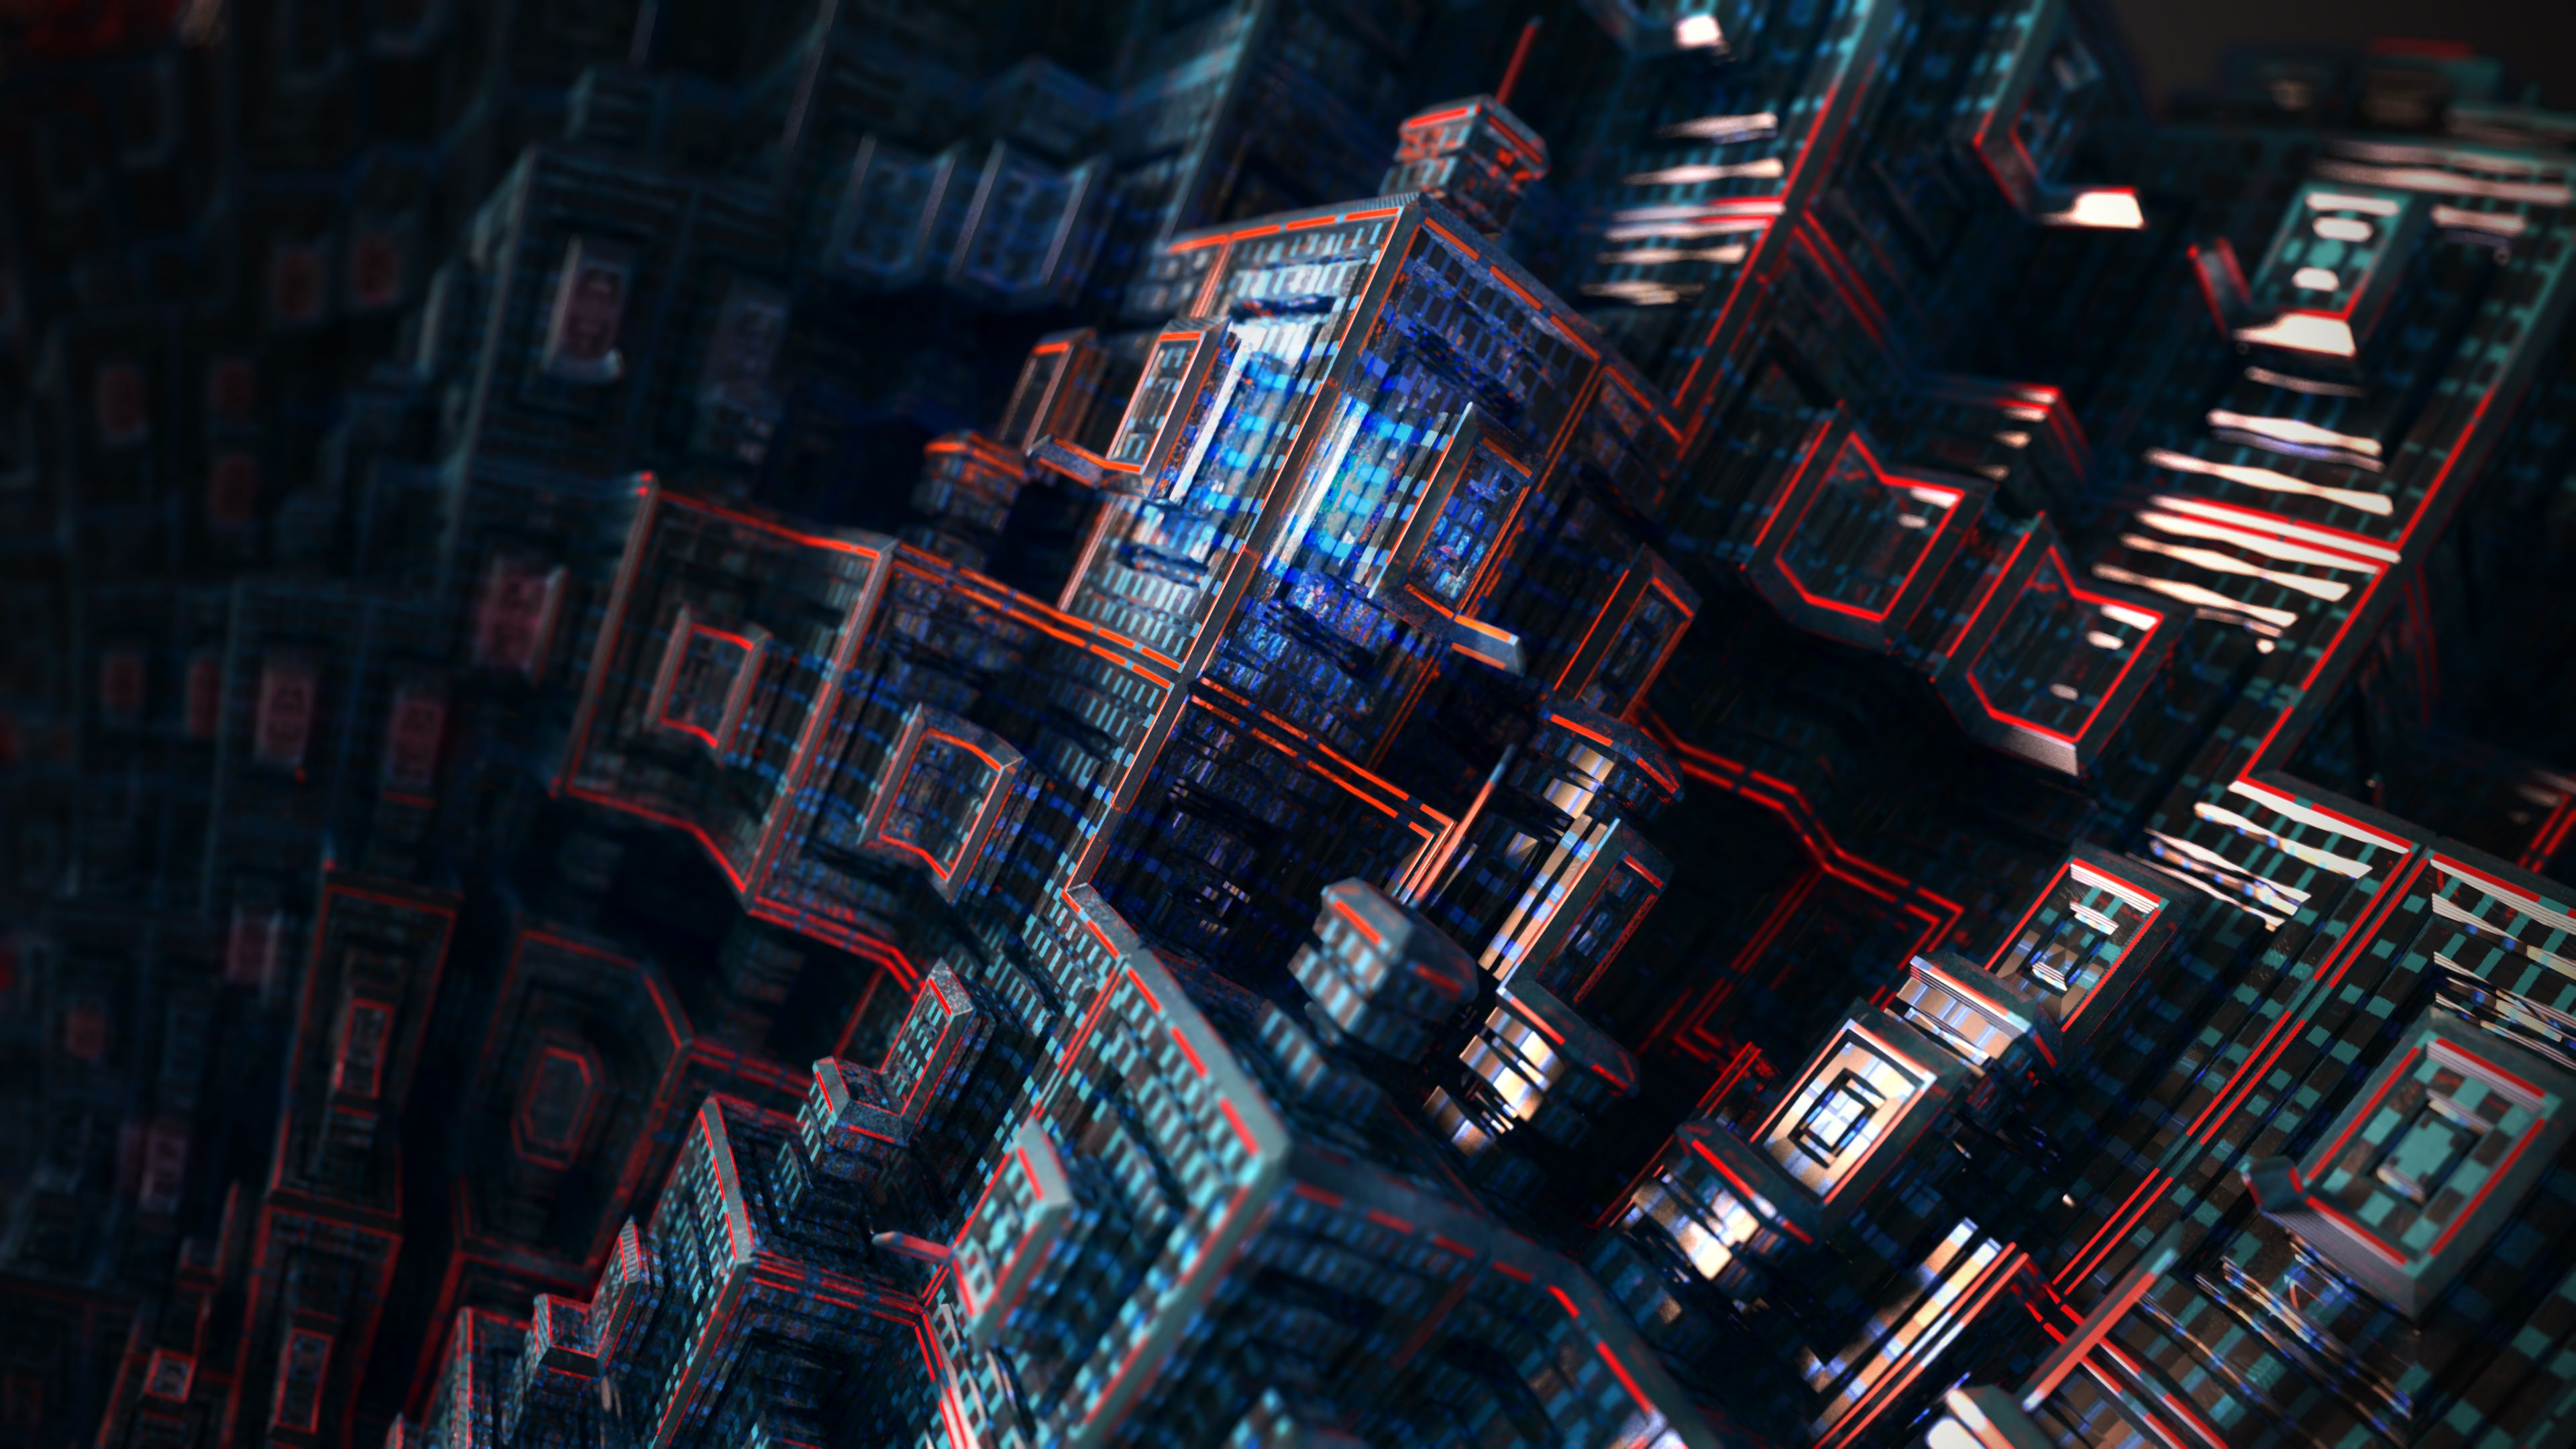 3D 4K Wallpapers Top Free 3D 4K Backgrounds WallpaperAccess